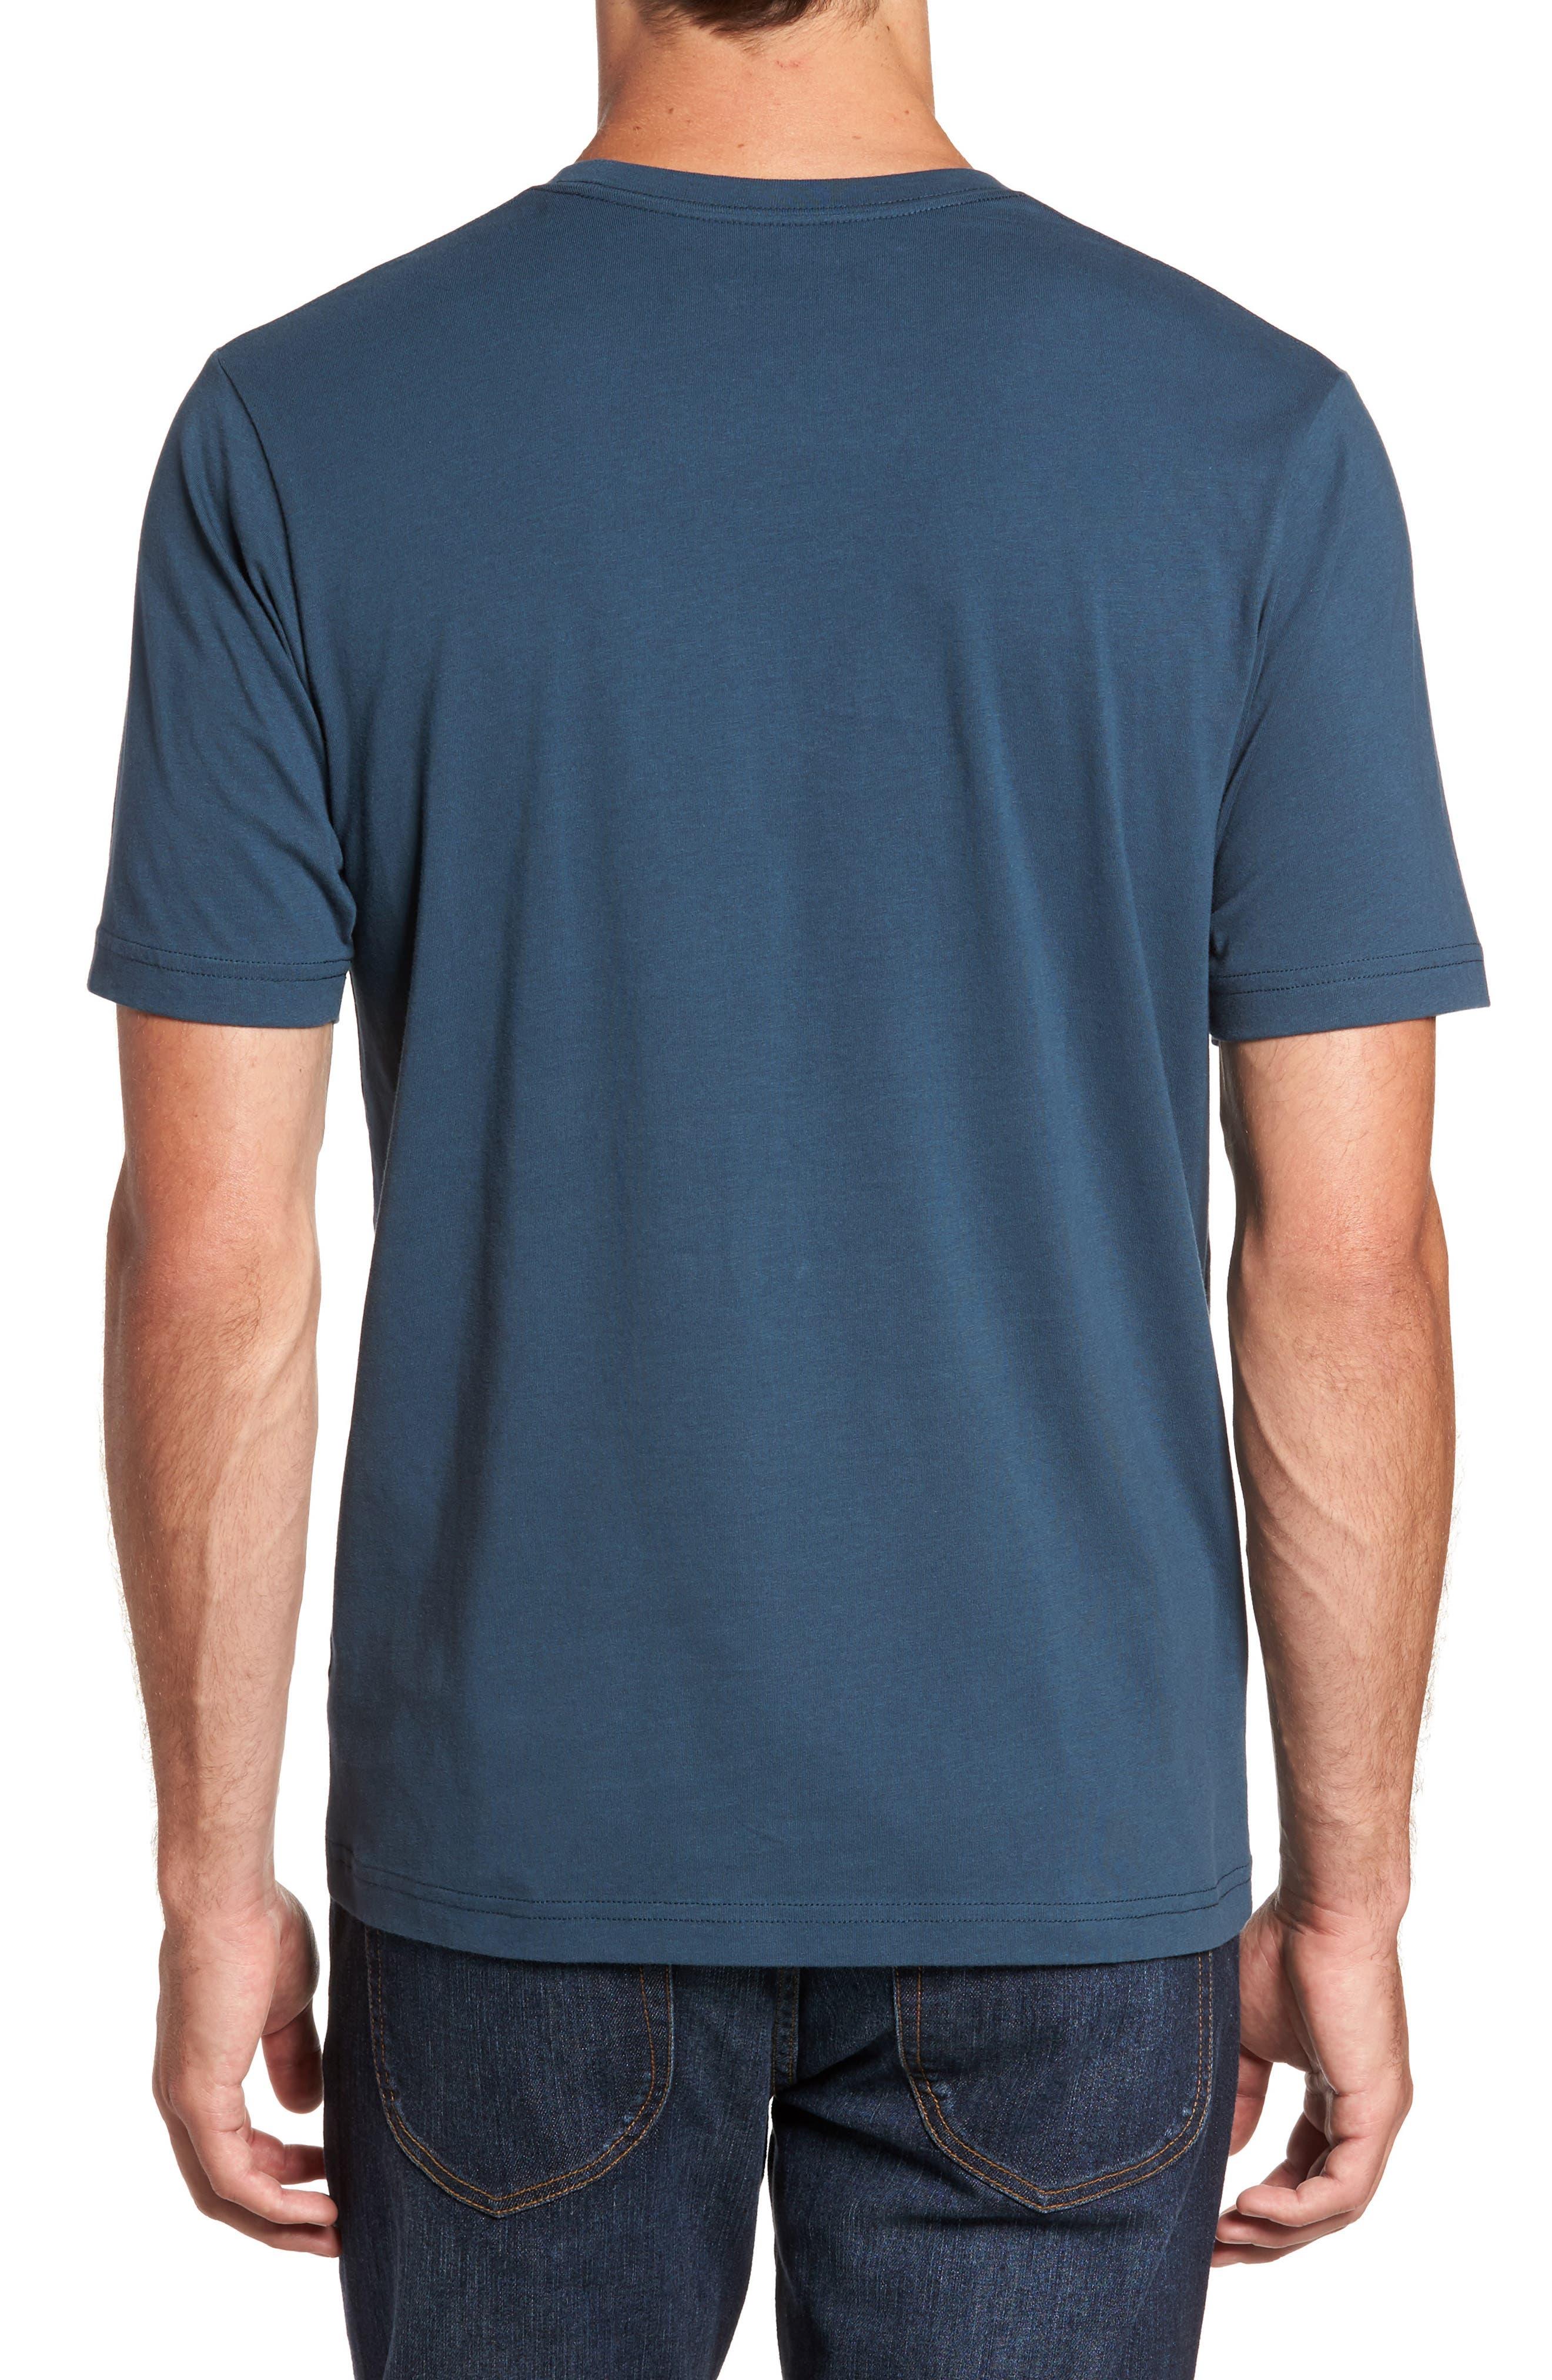 PBFU Graphic T-Shirt,                             Alternate thumbnail 2, color,                             400